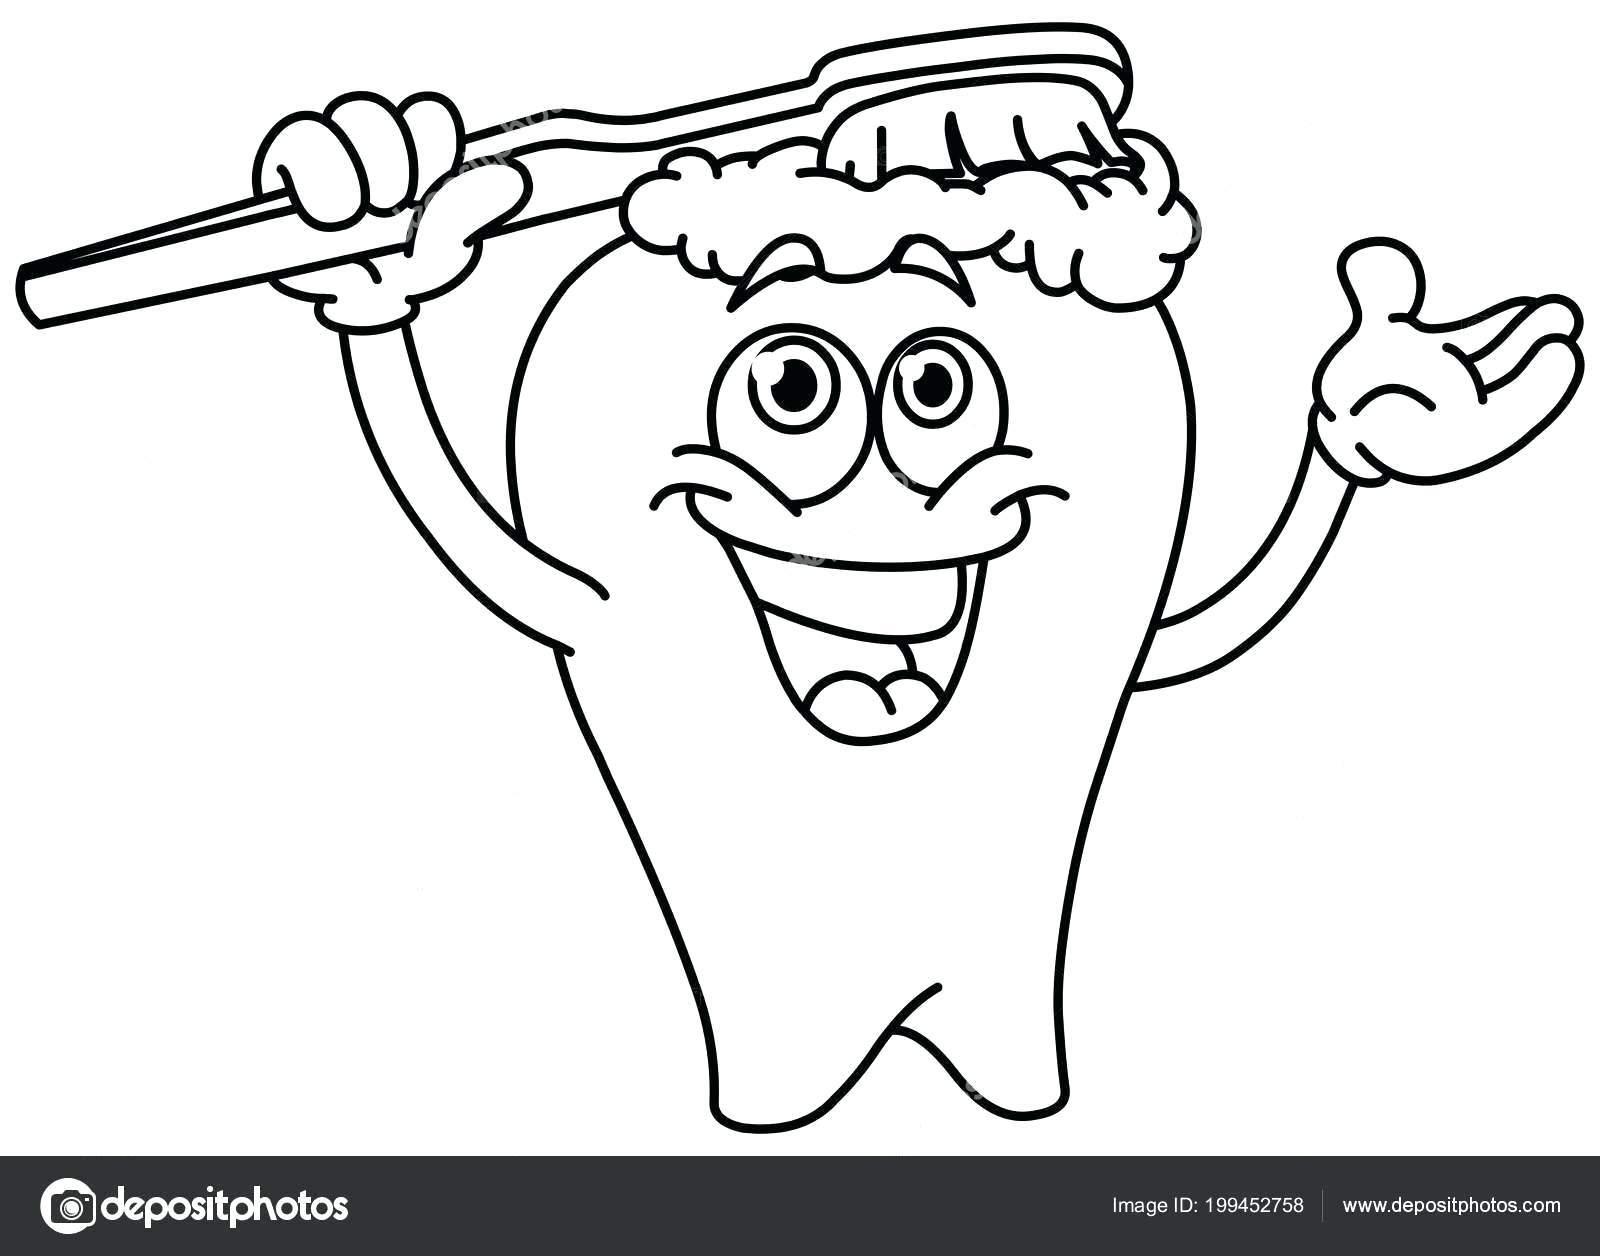 16 Coloring Page Brushing Teeth